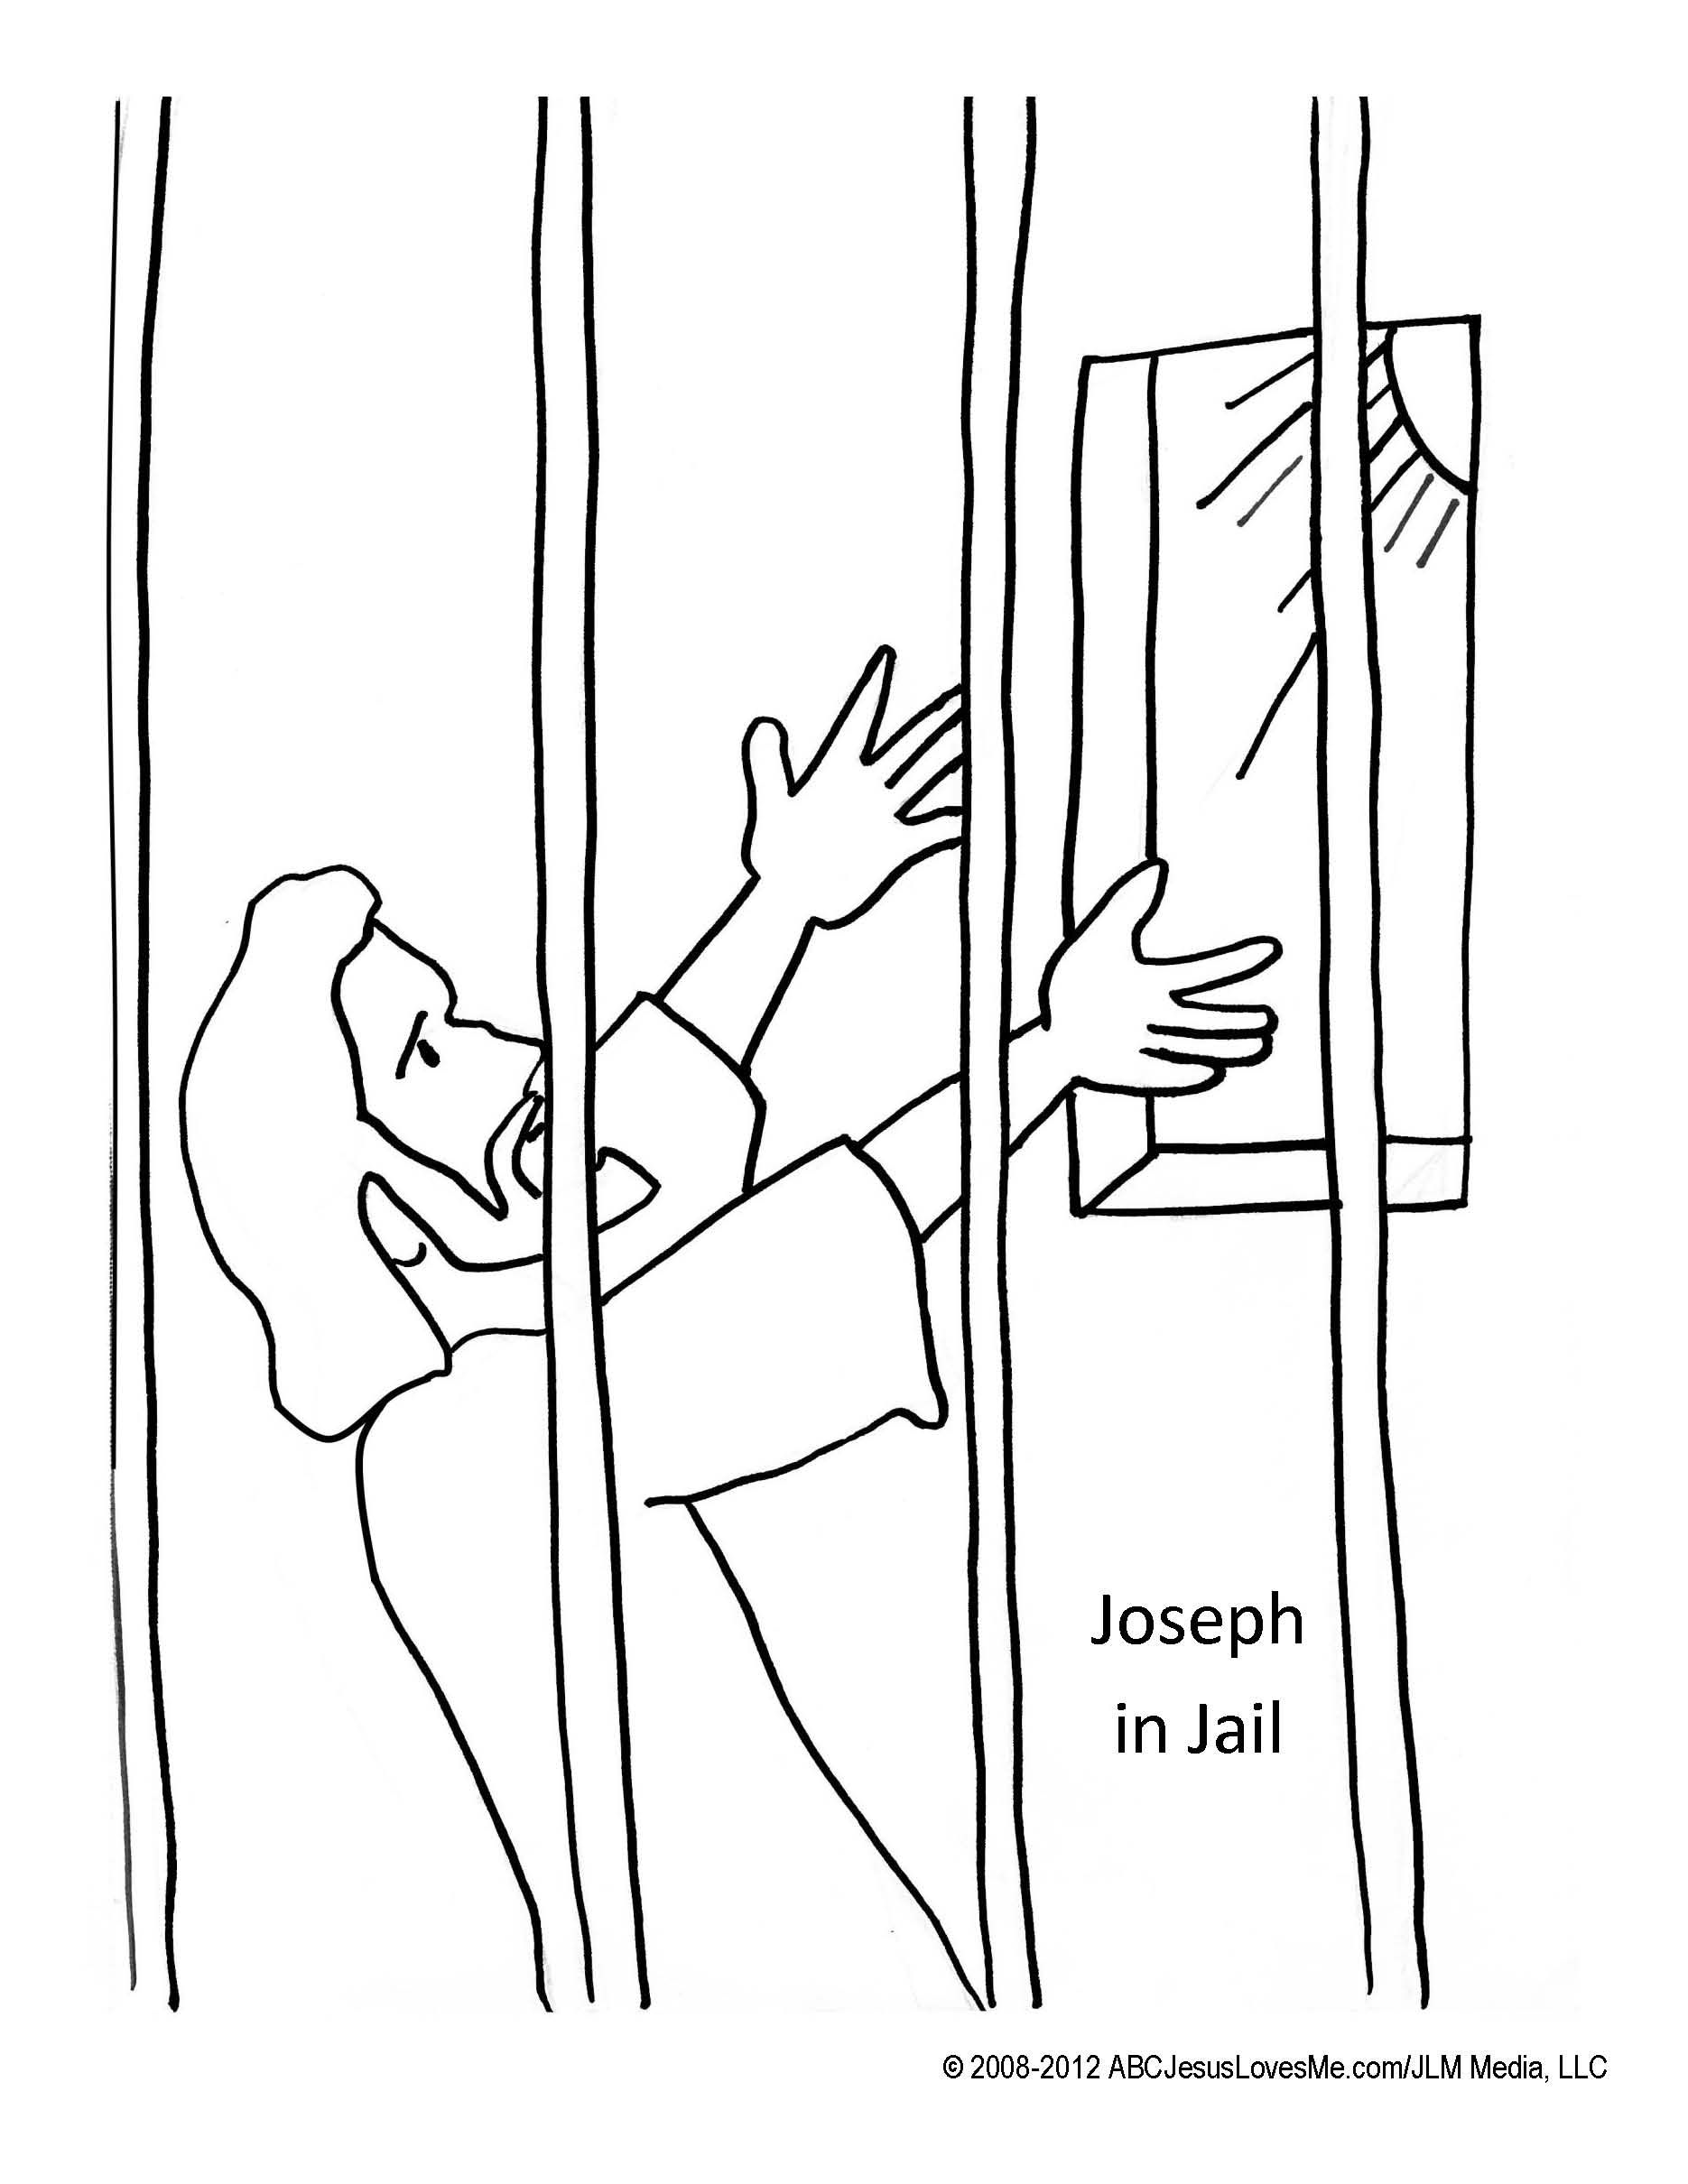 May 17 18 Joseph In Jail Glue Paper Onto Bars